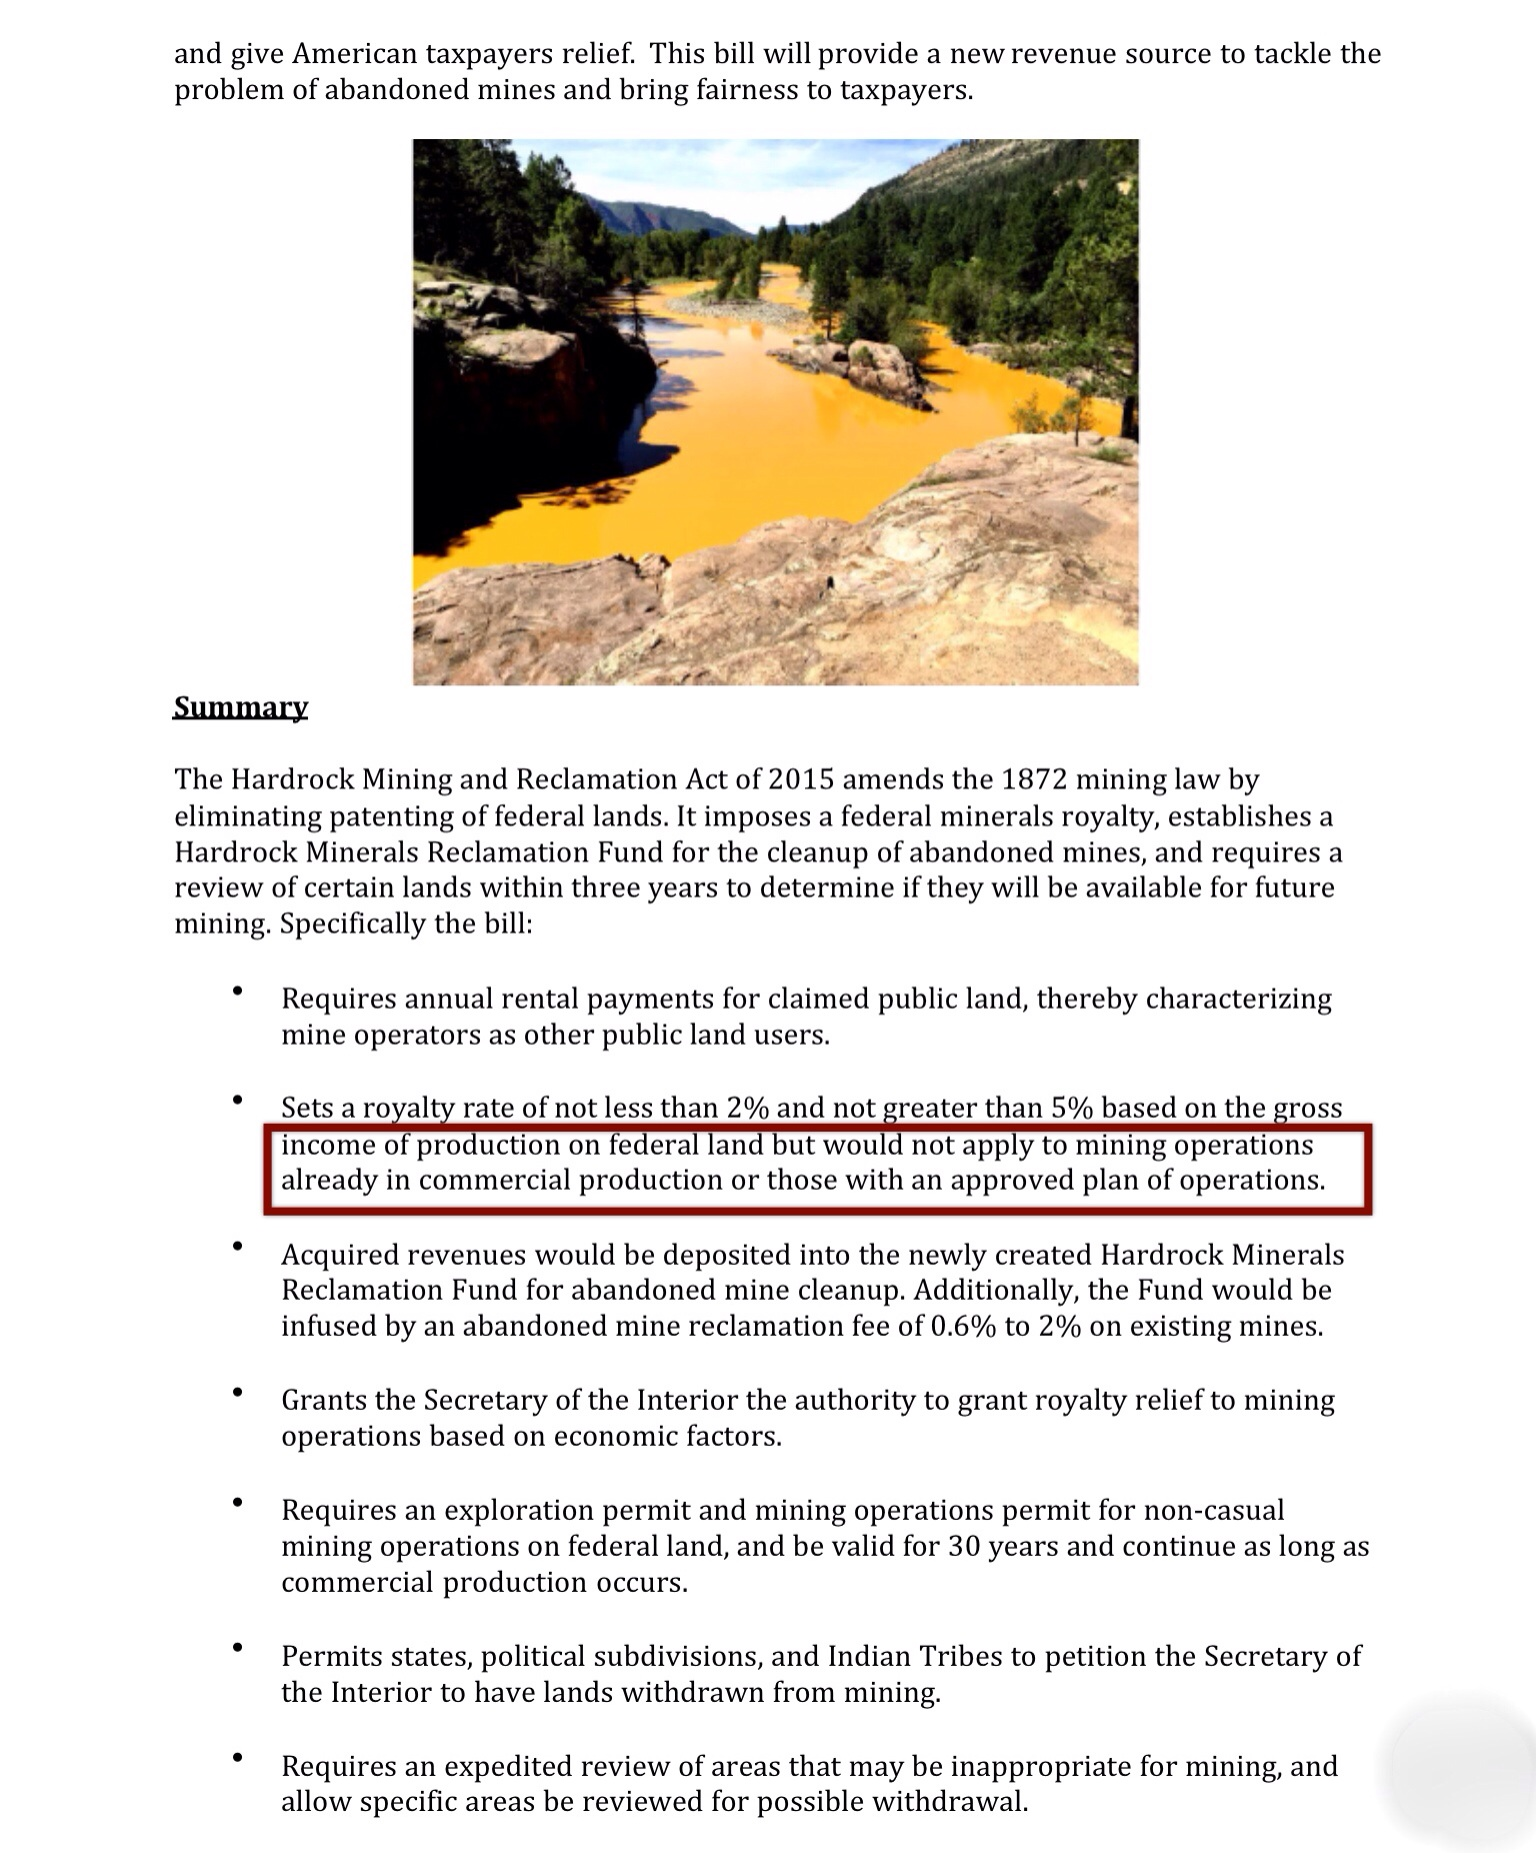 Ways to reform 1872 mining law summary